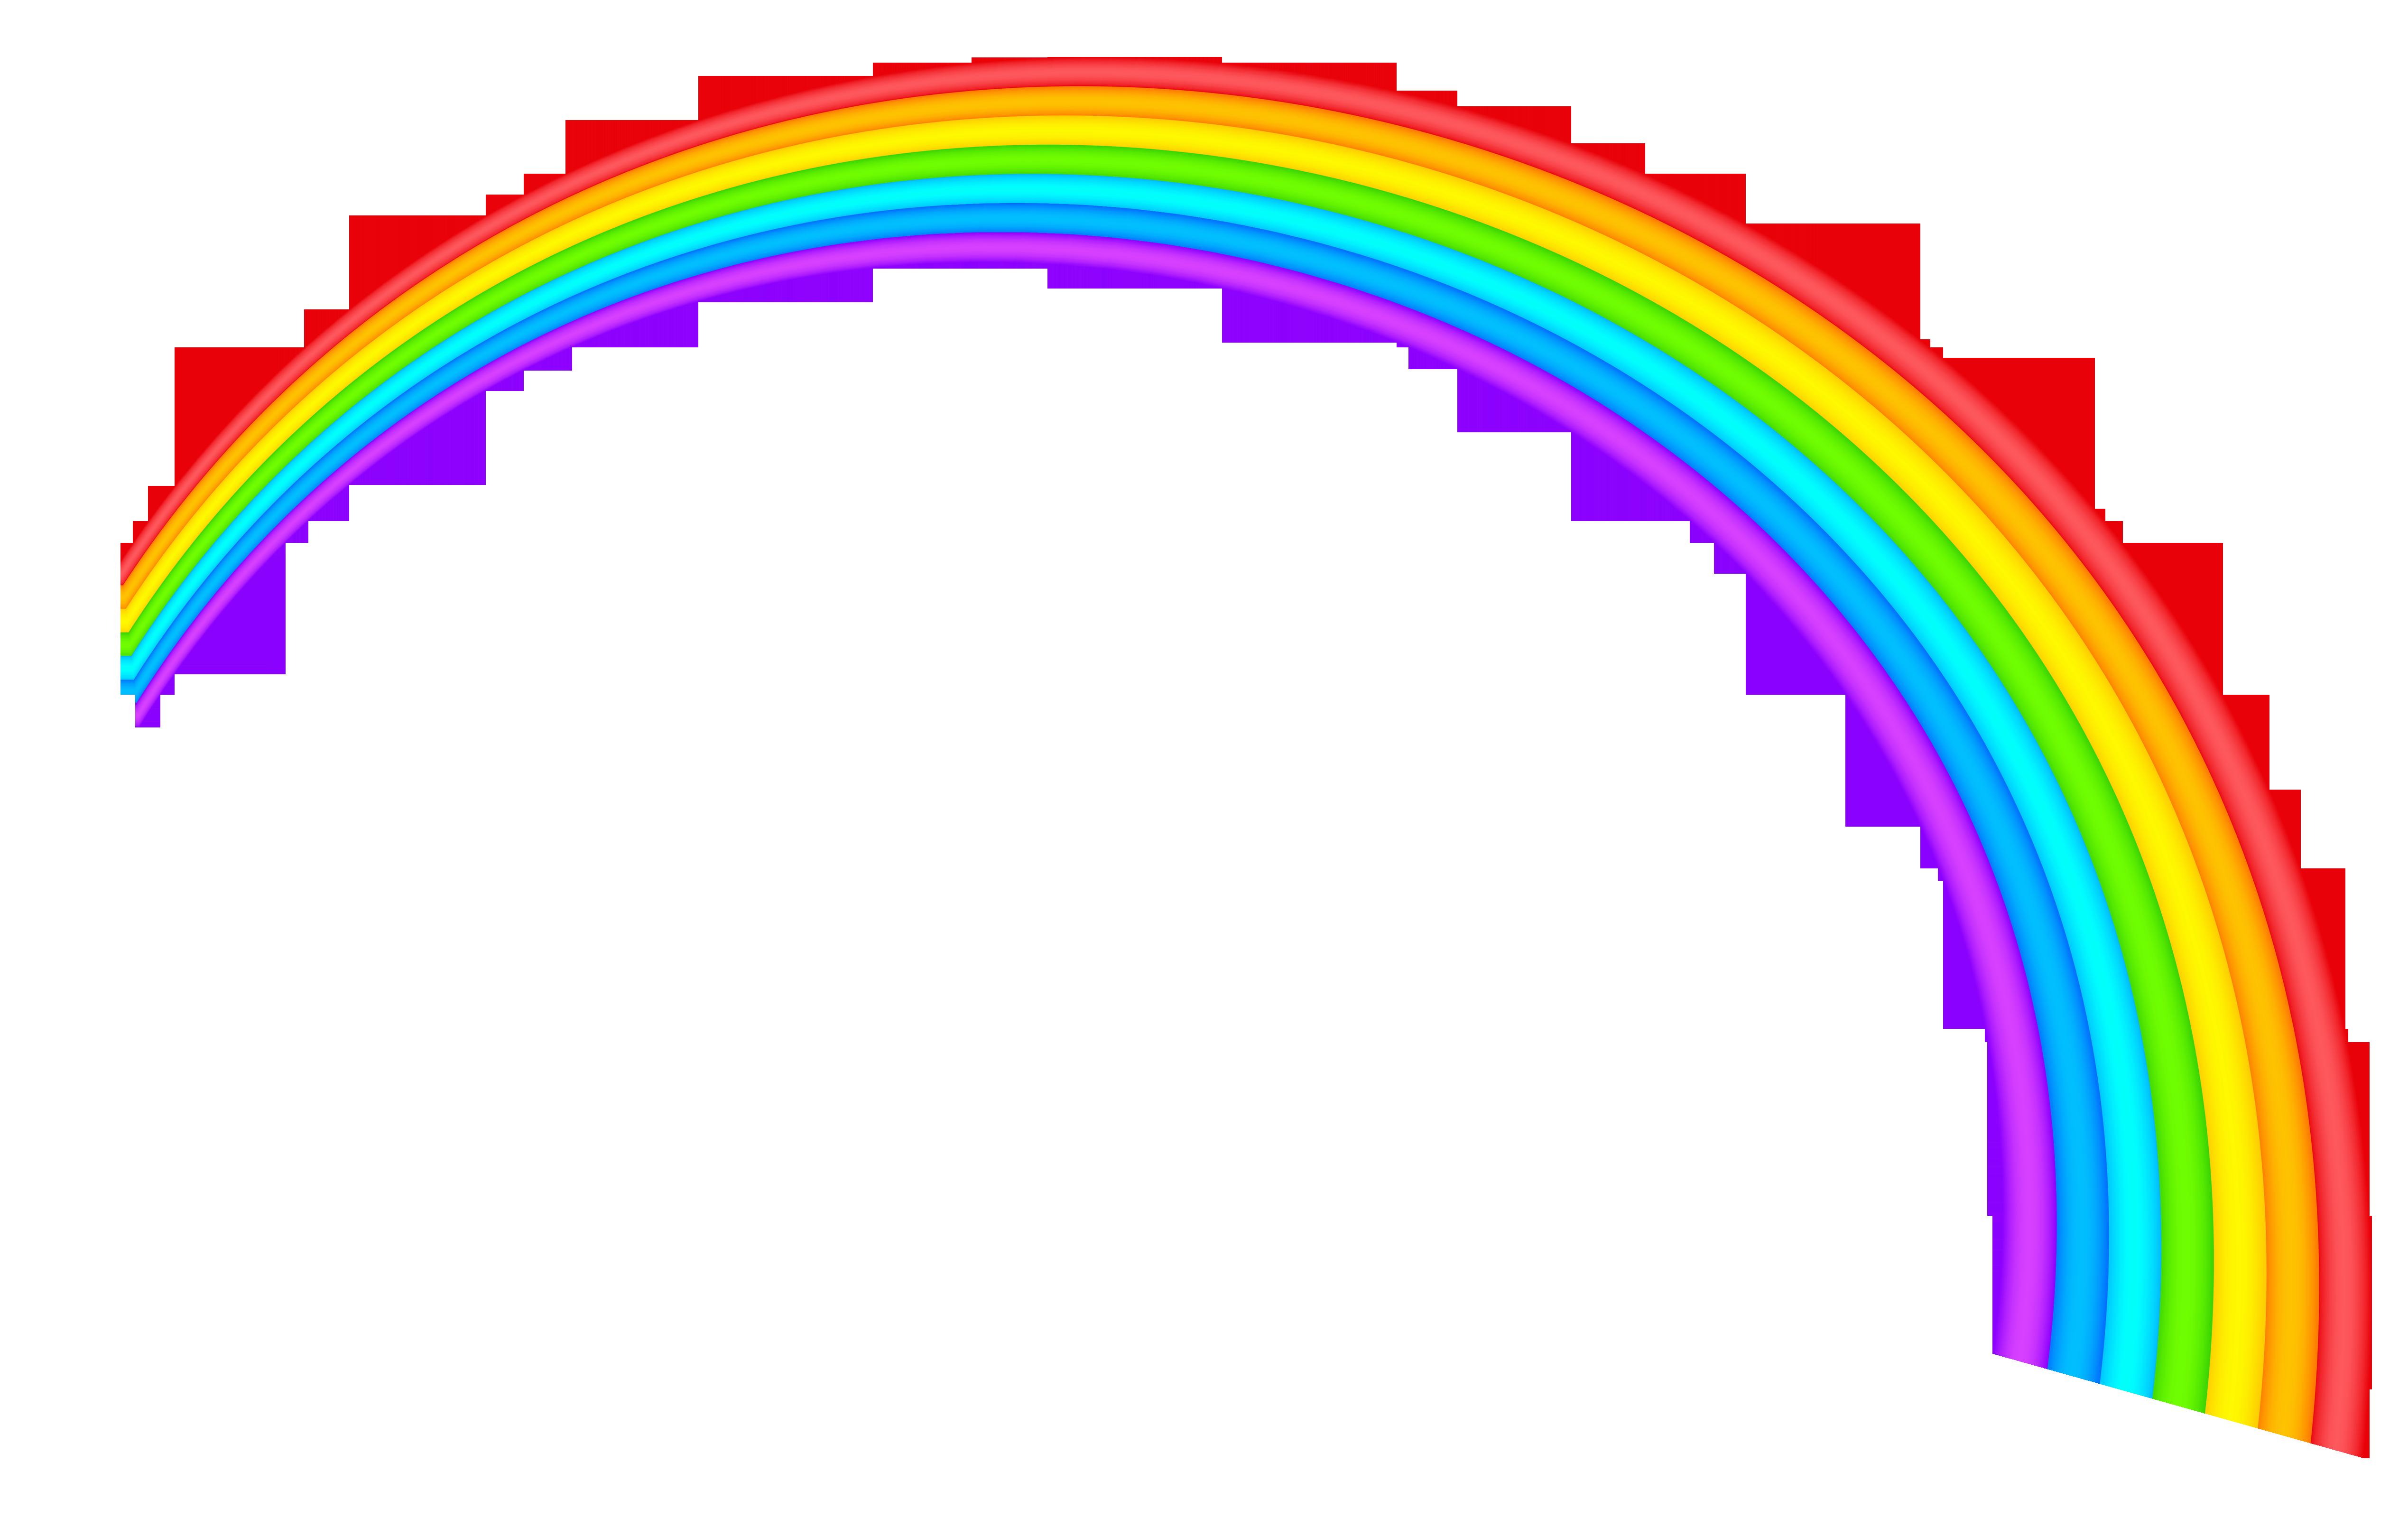 Free rainbow clipart public .-Free rainbow clipart public .-15